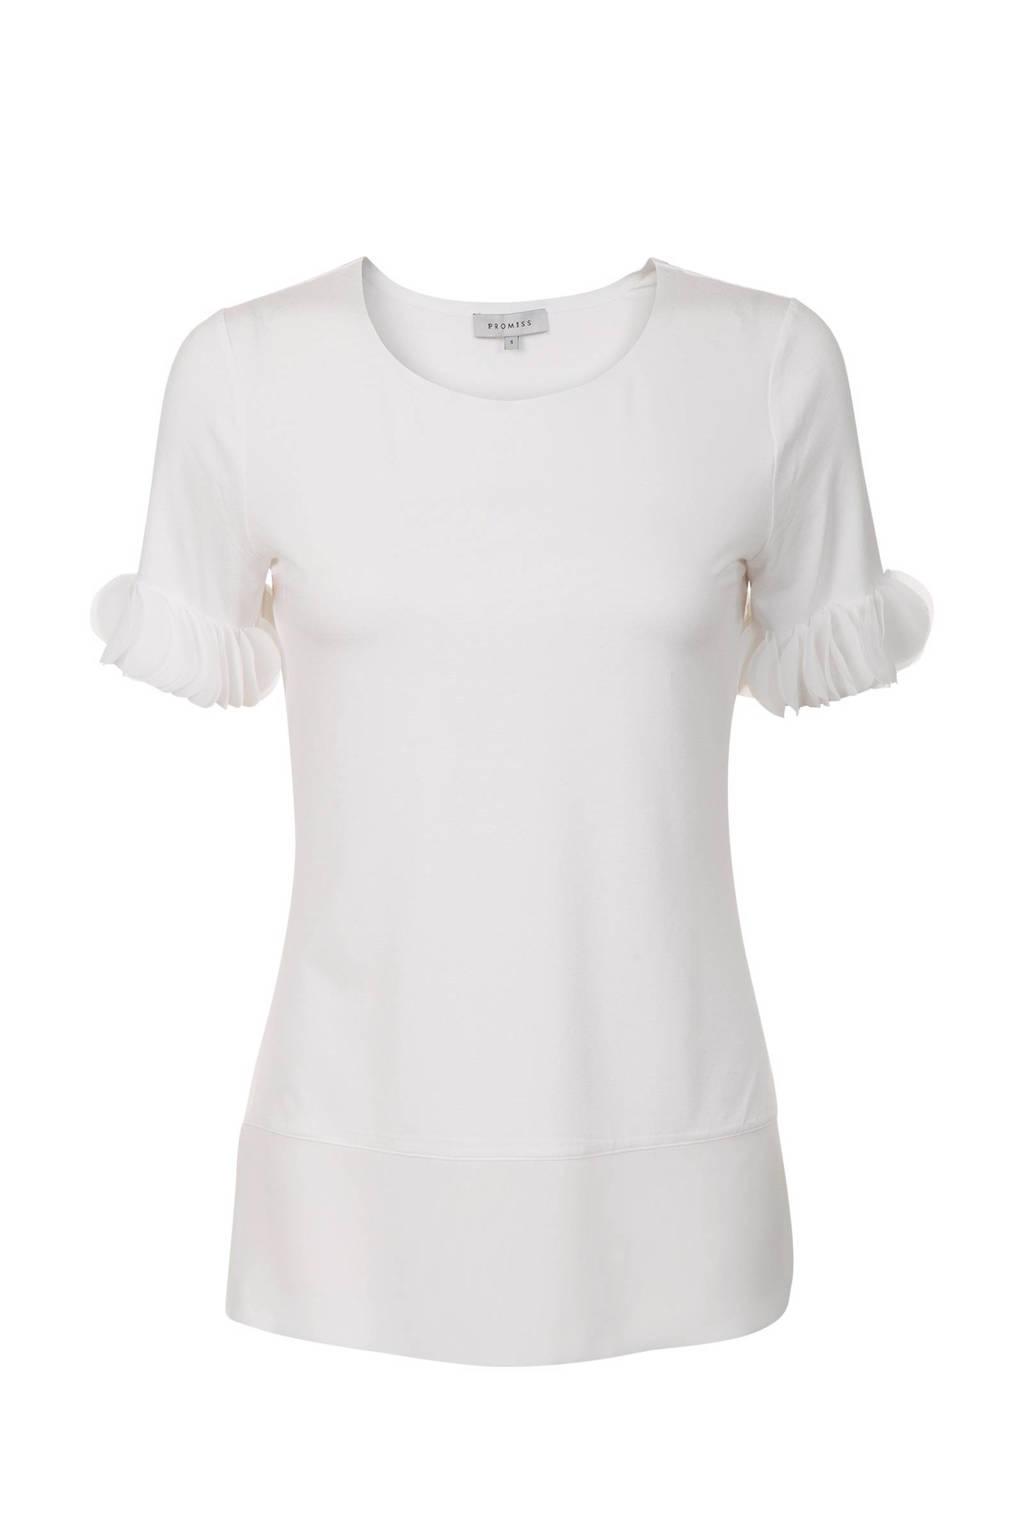 Promiss T-shirt wit, Wit